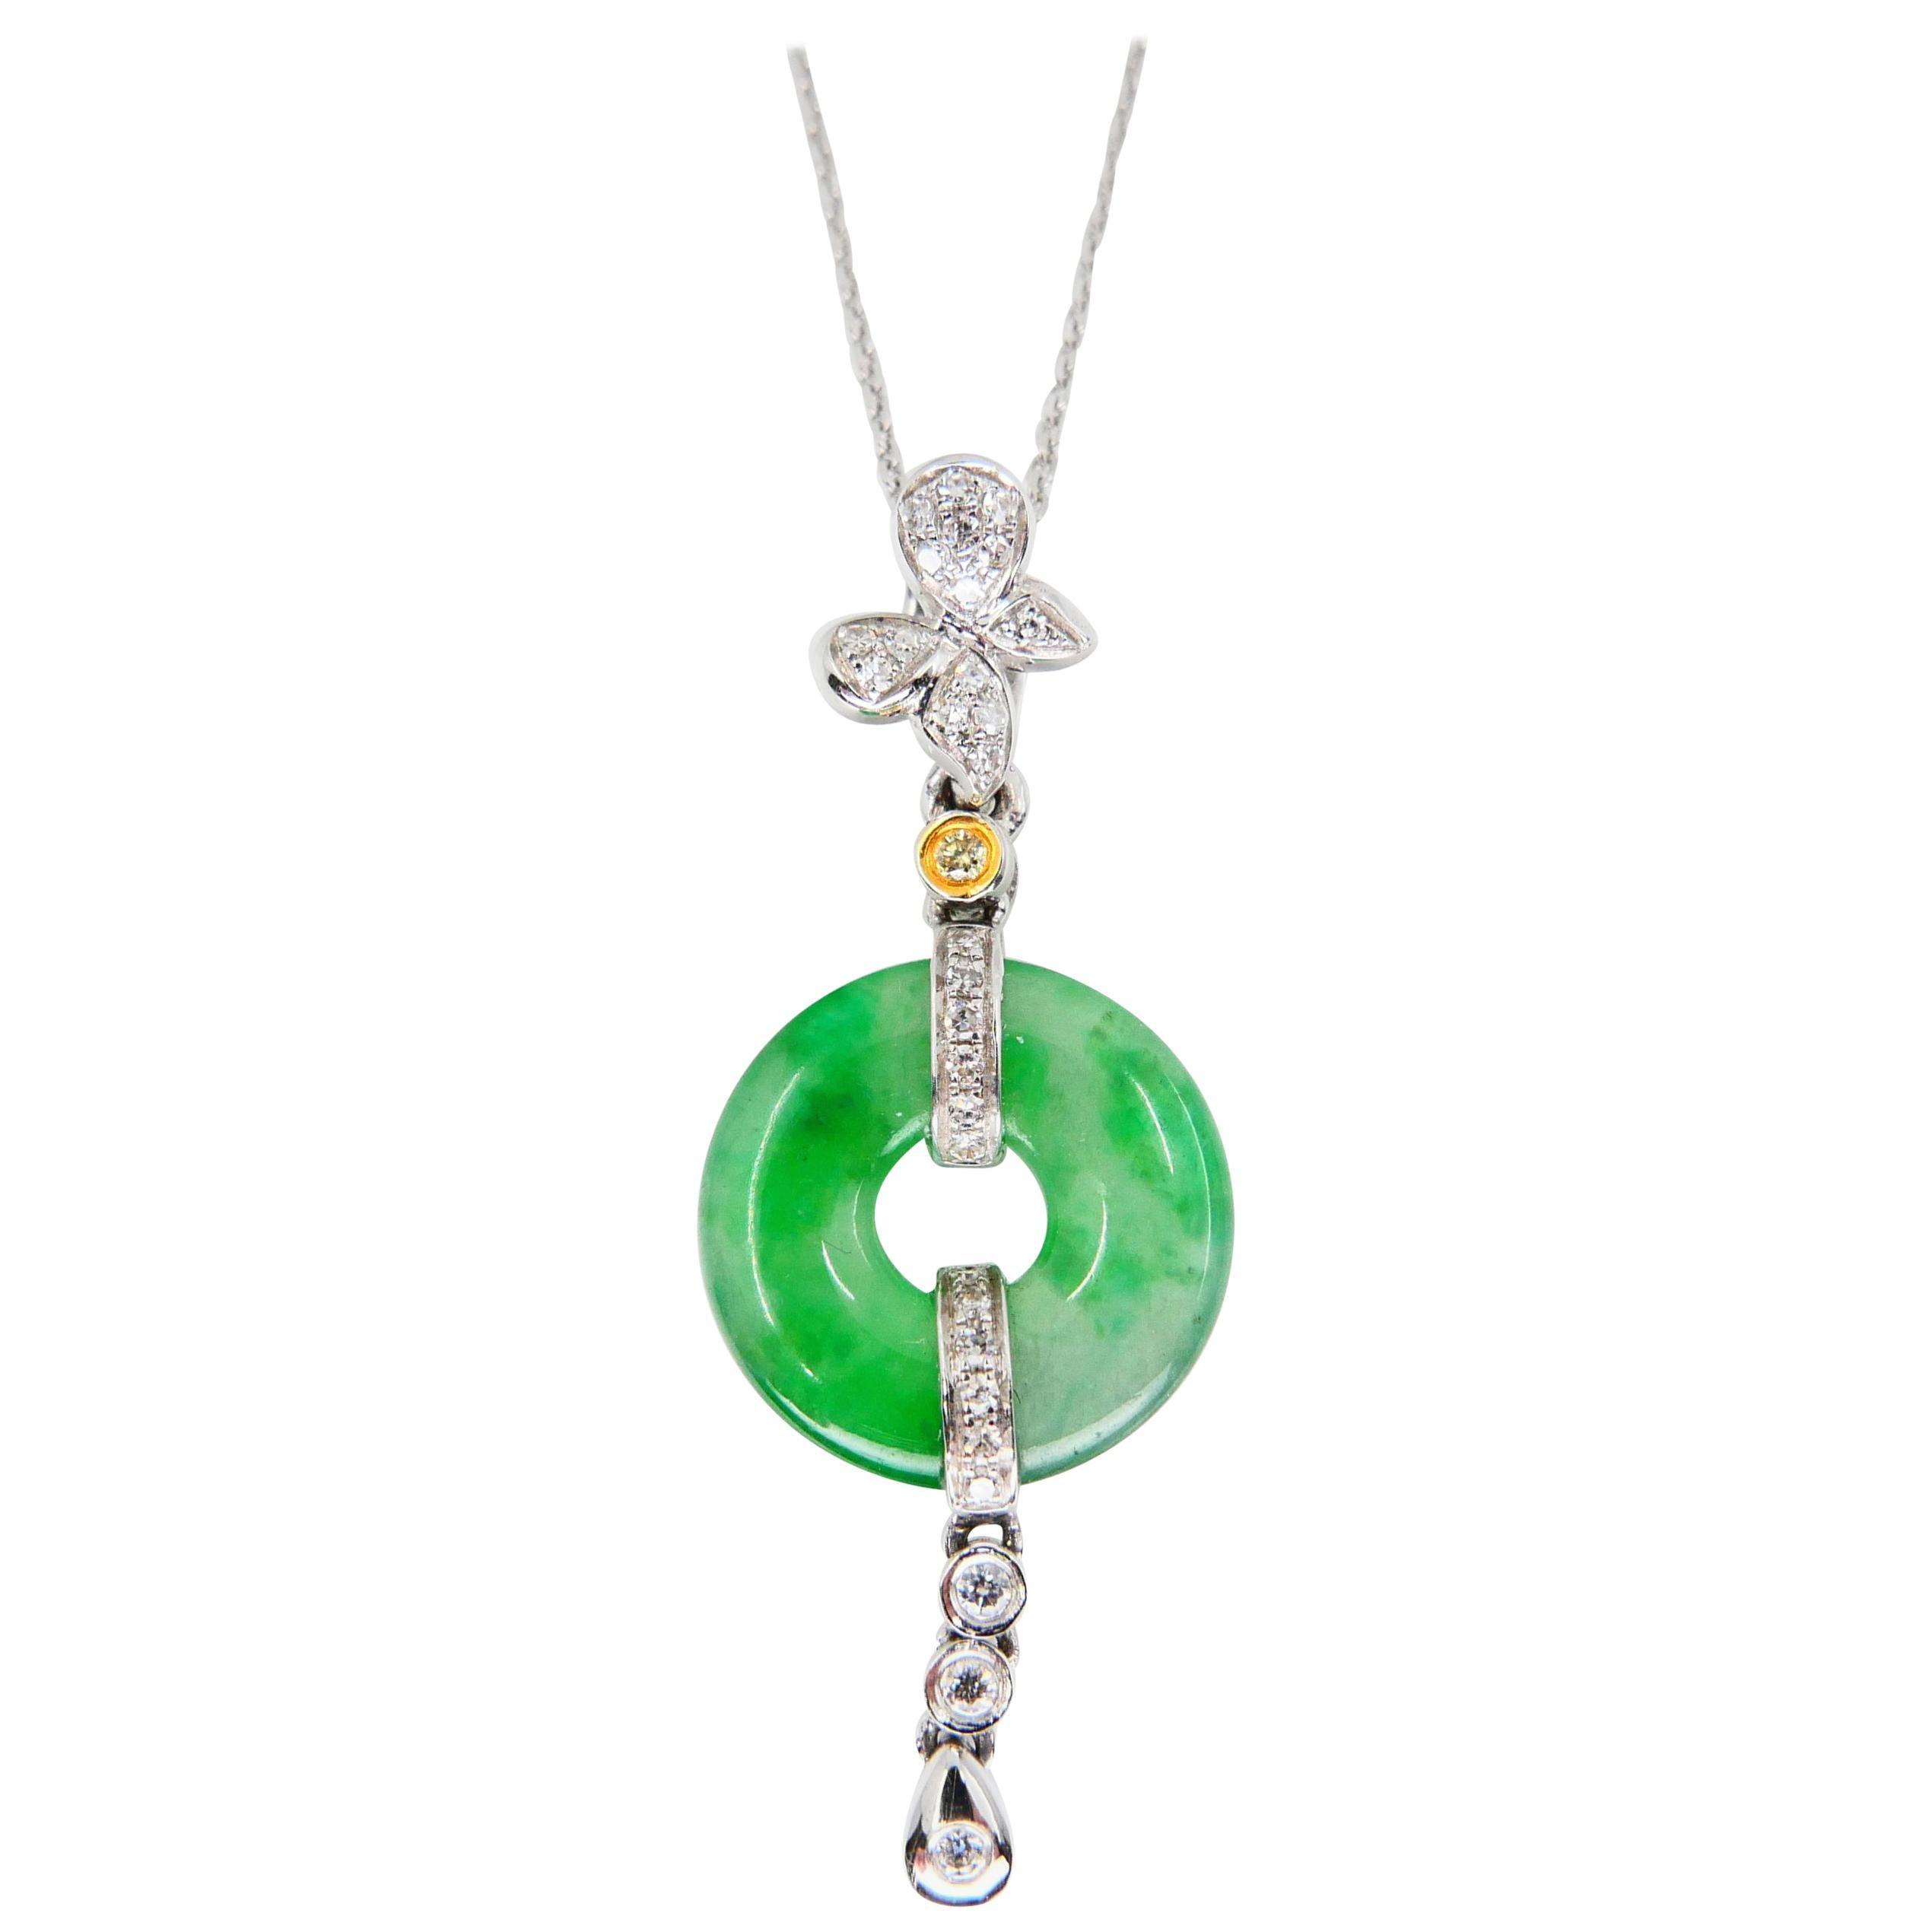 Certified Type A Jadeite Jade Diamond Pendant Drop Necklace, Apple Green Veins